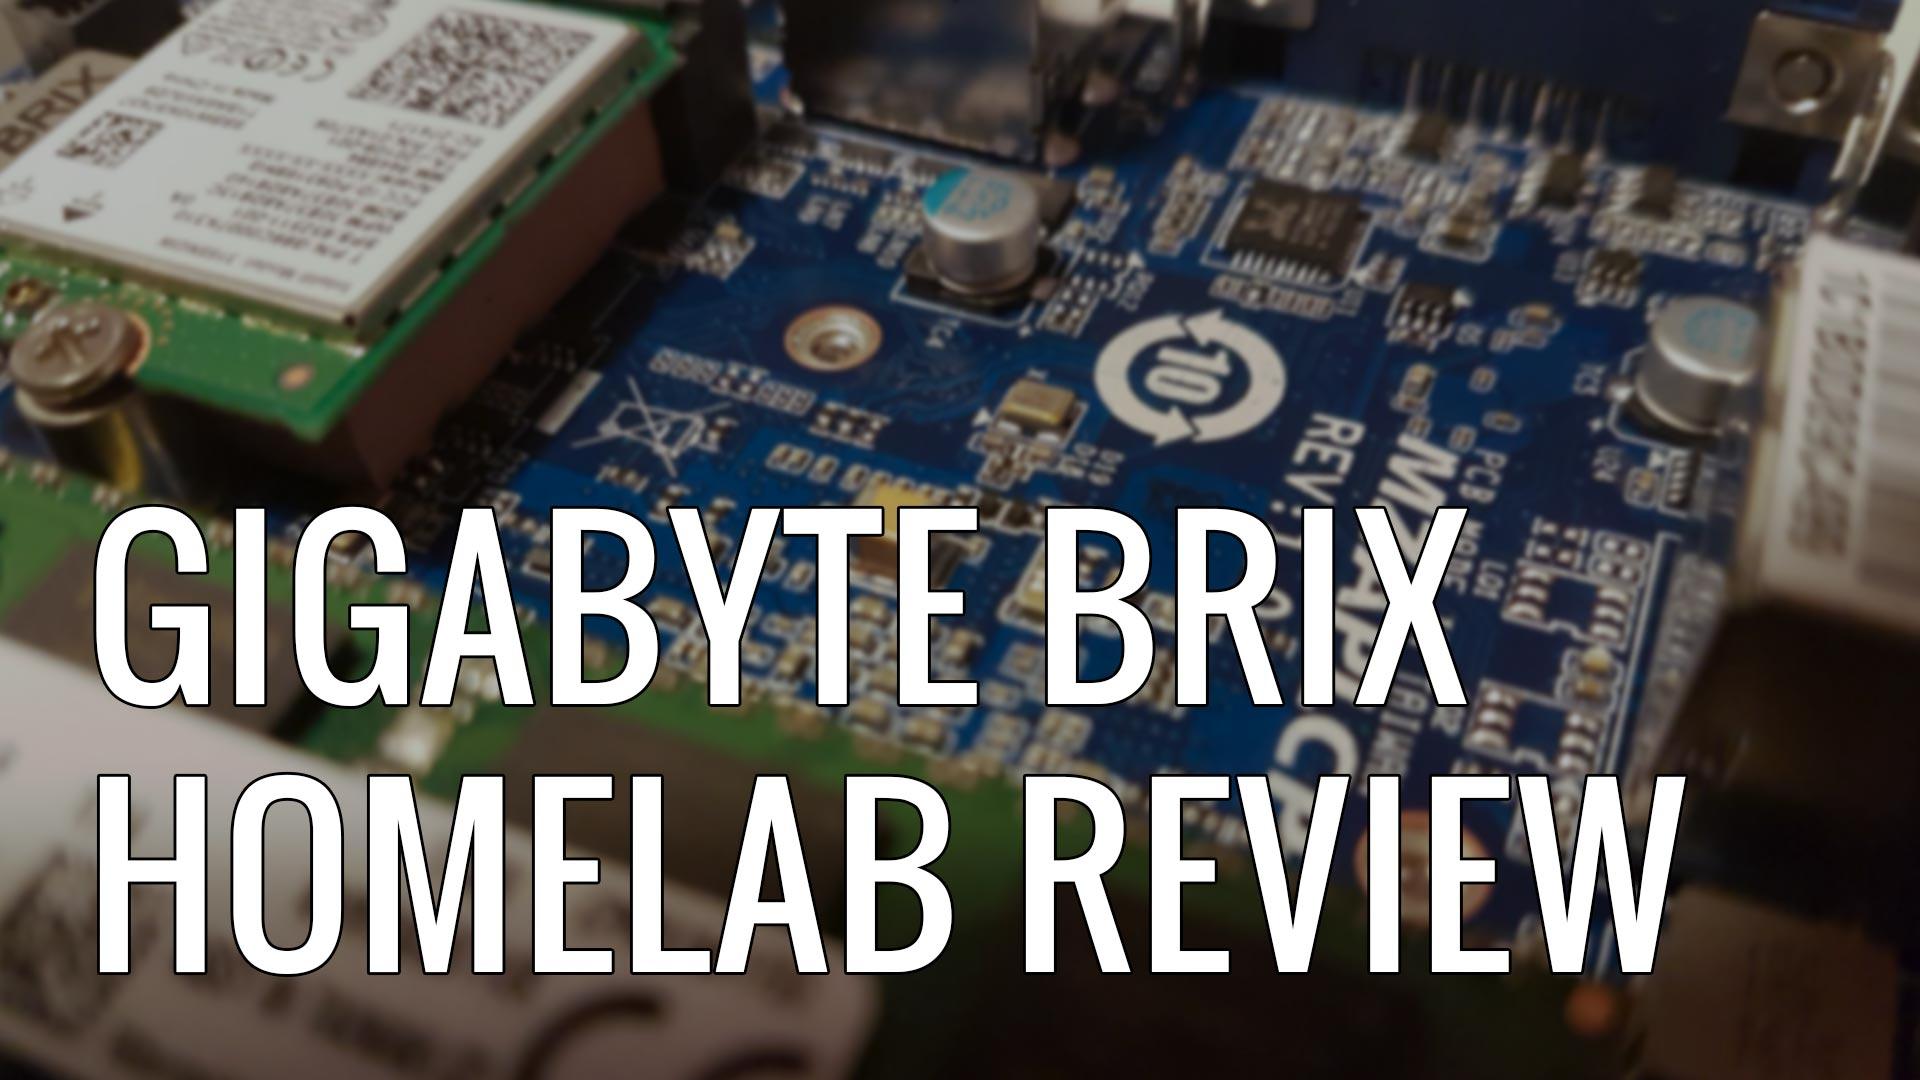 Gigabyte Brix GB-BPCE-3350C HomeLab Review